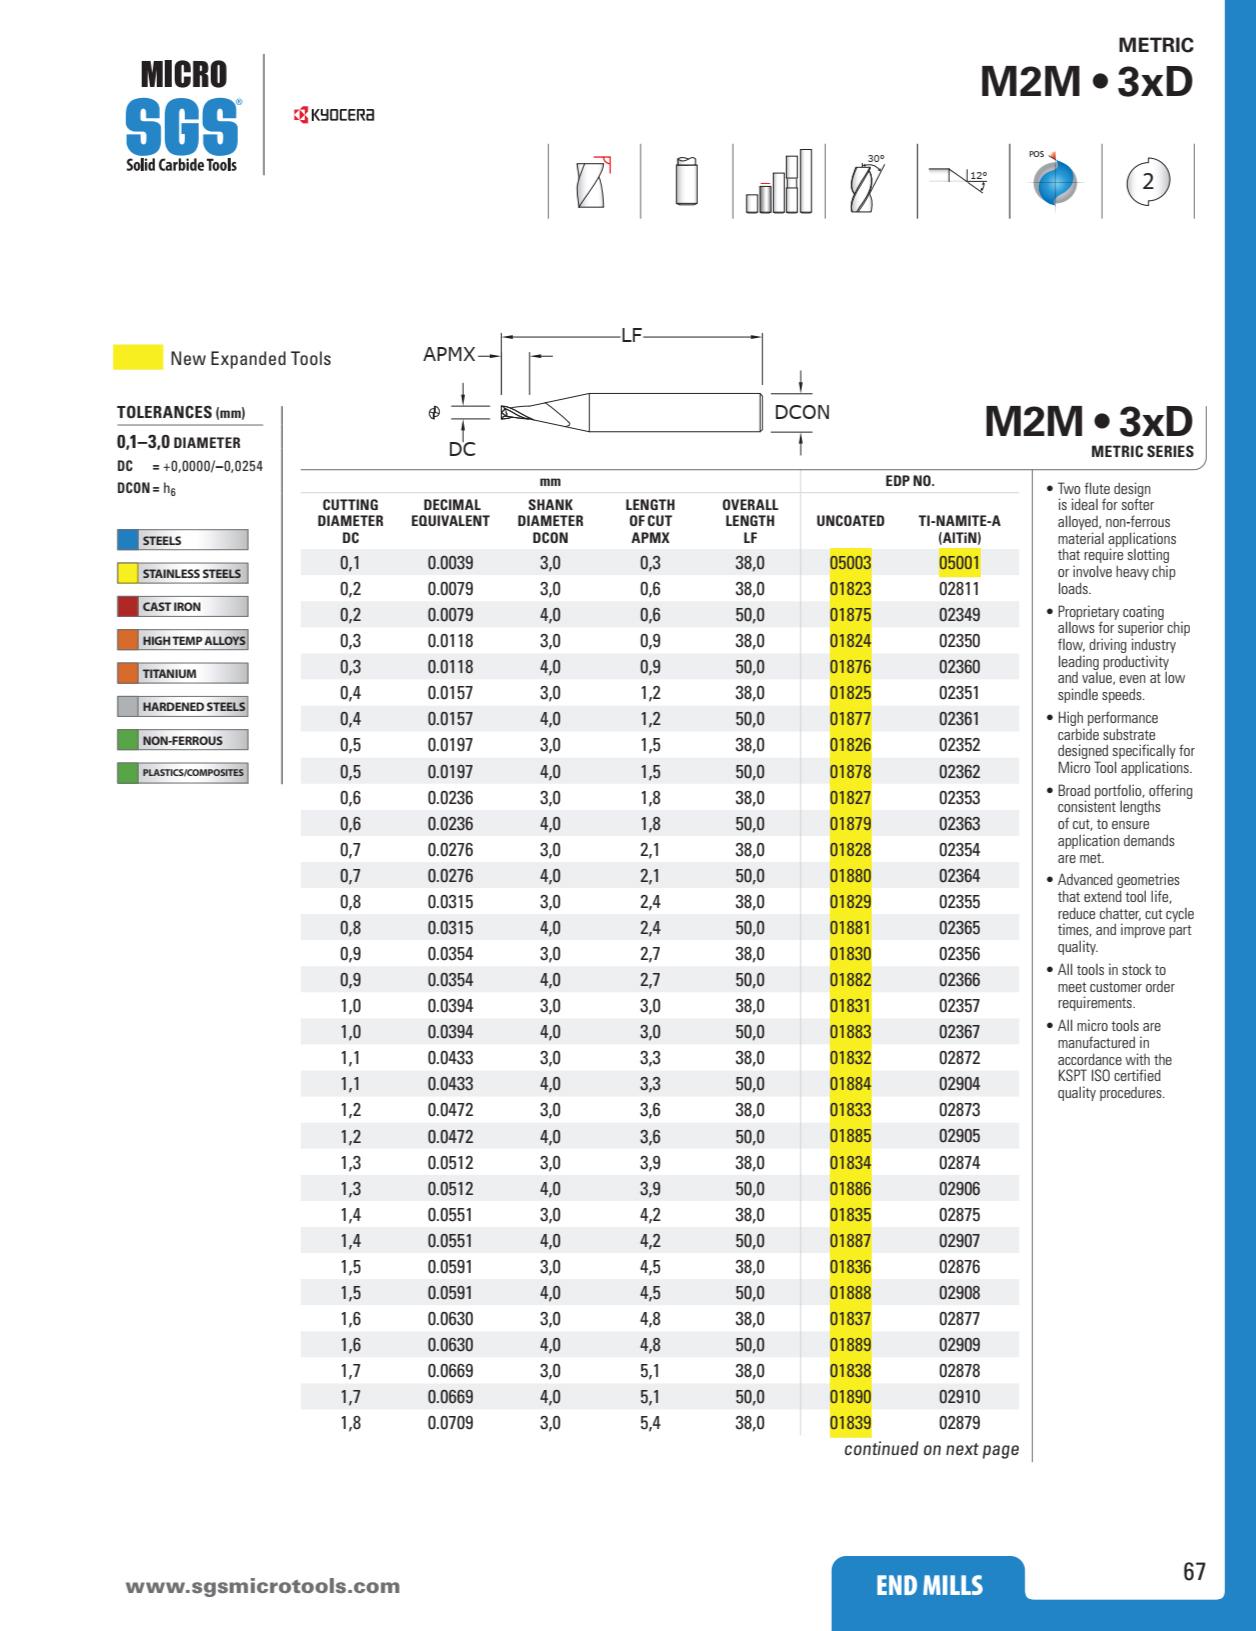 Dao Phay Hợp Kim 2F Kyocera SGS M2M Series 2